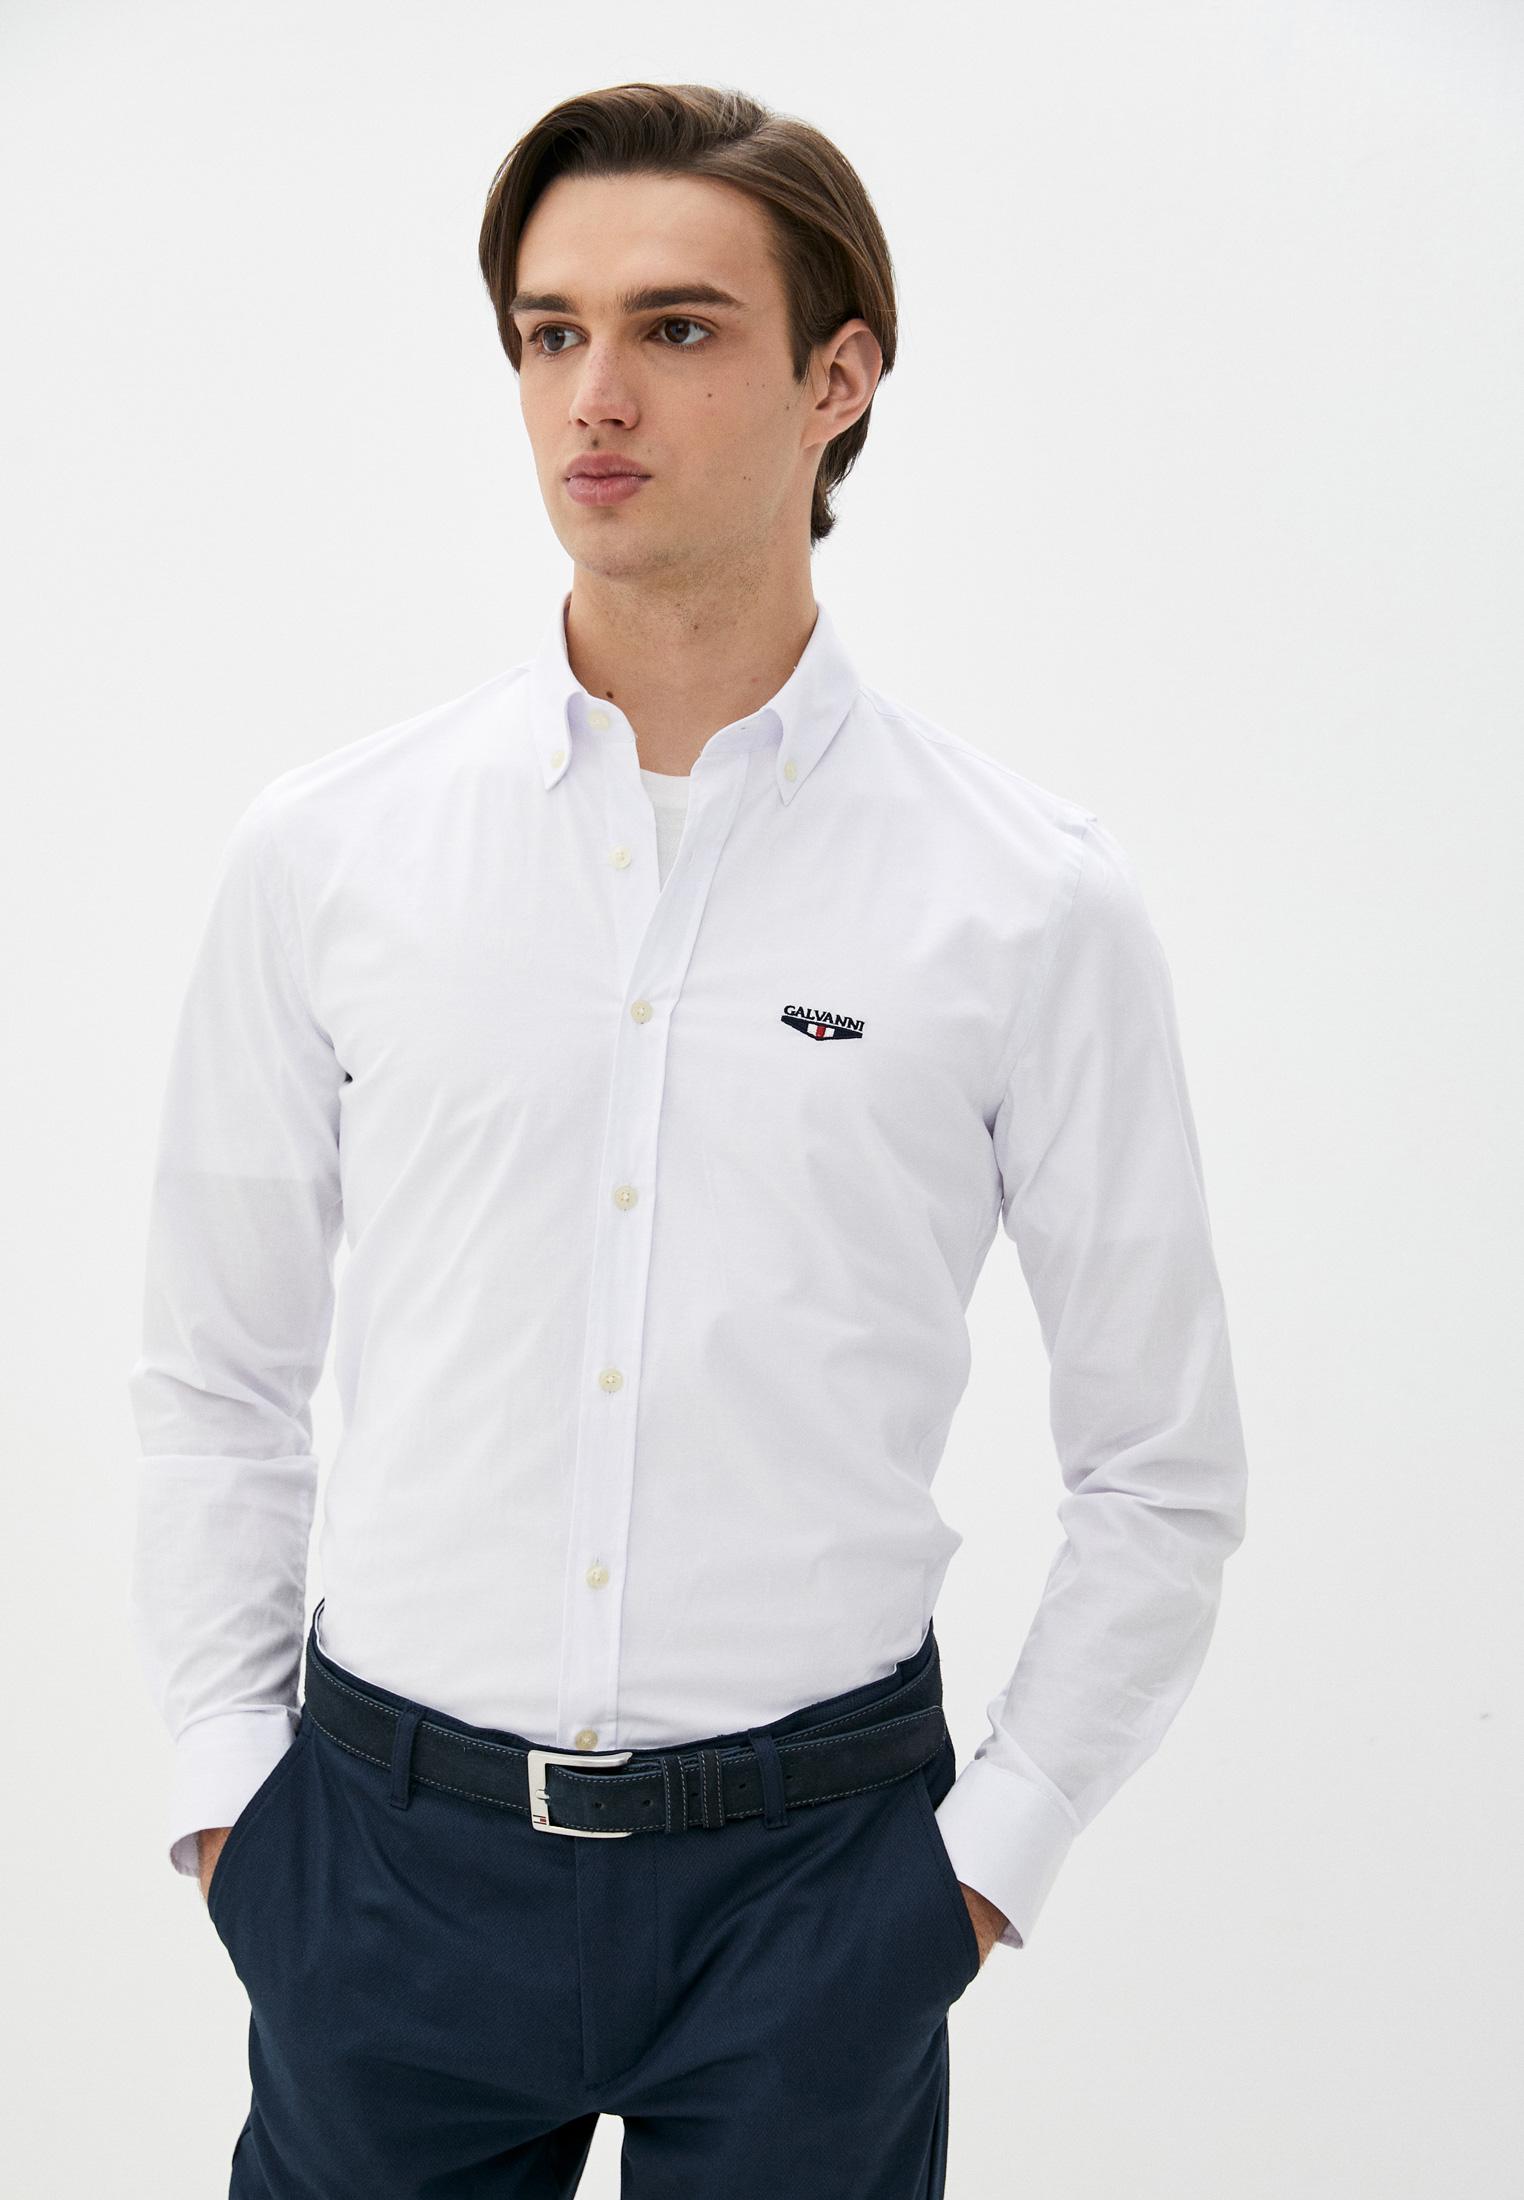 Рубашка с длинным рукавом Galvanni BOSSIER